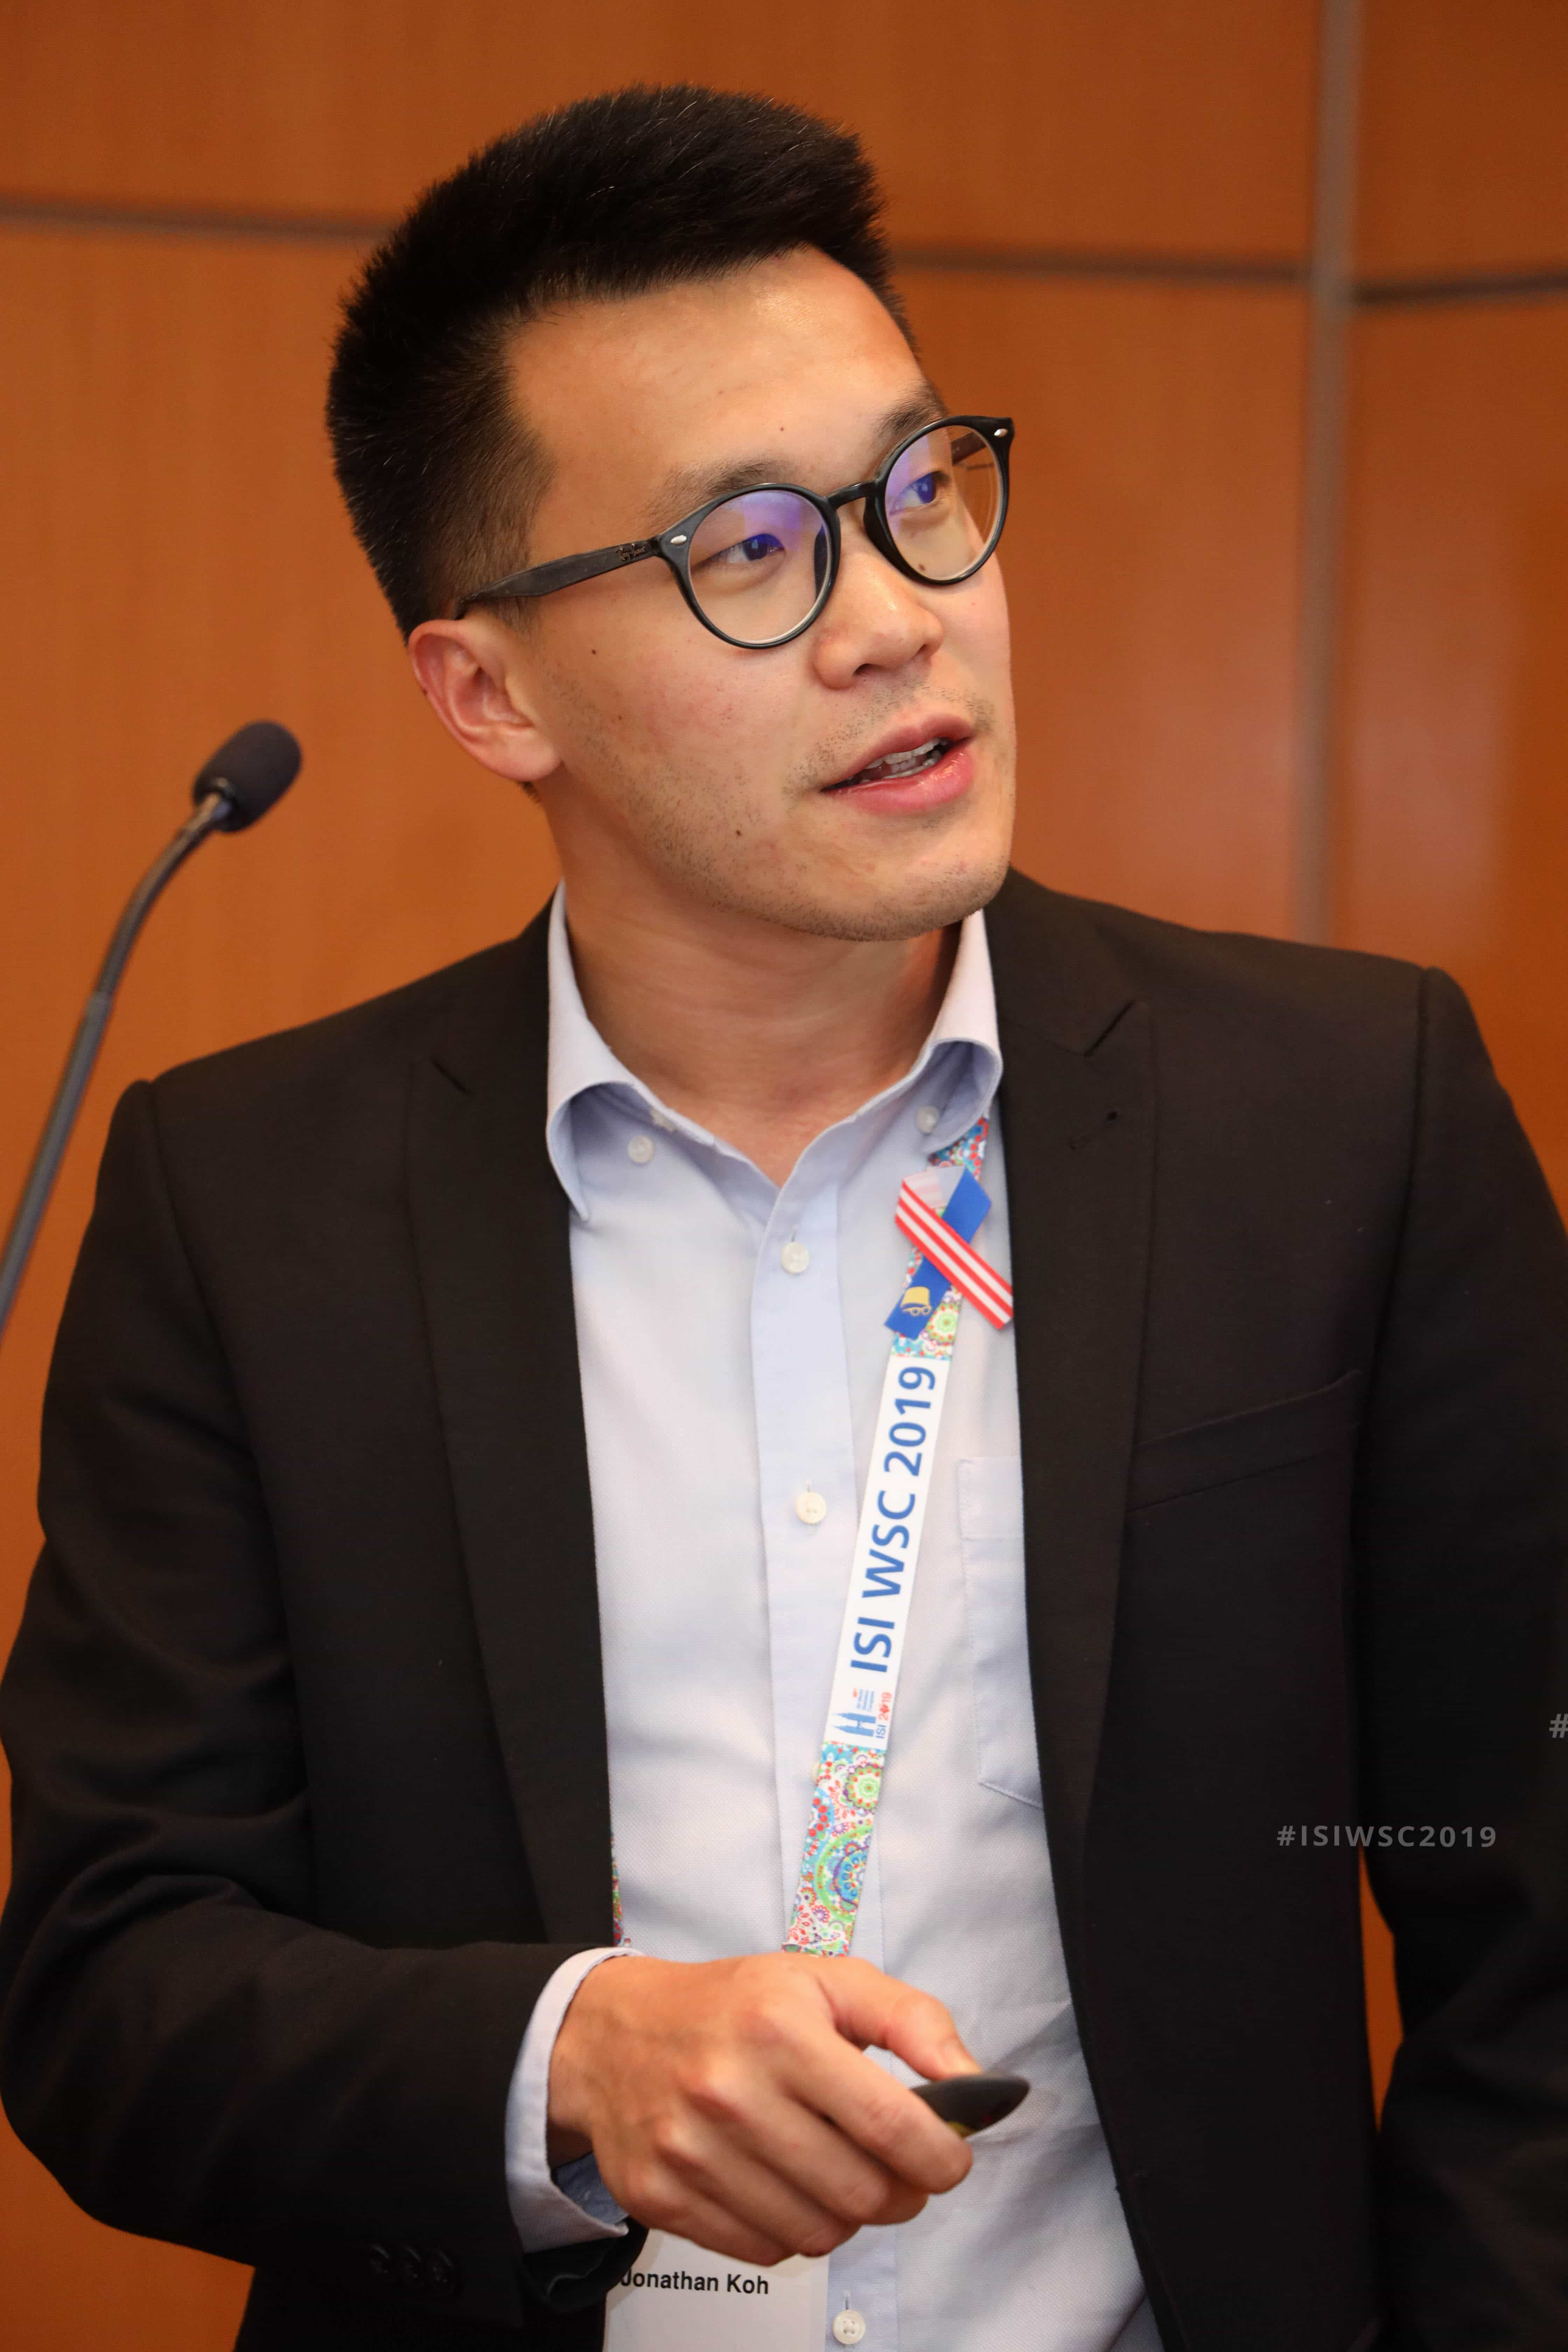 Jonathan Koh Boon Han